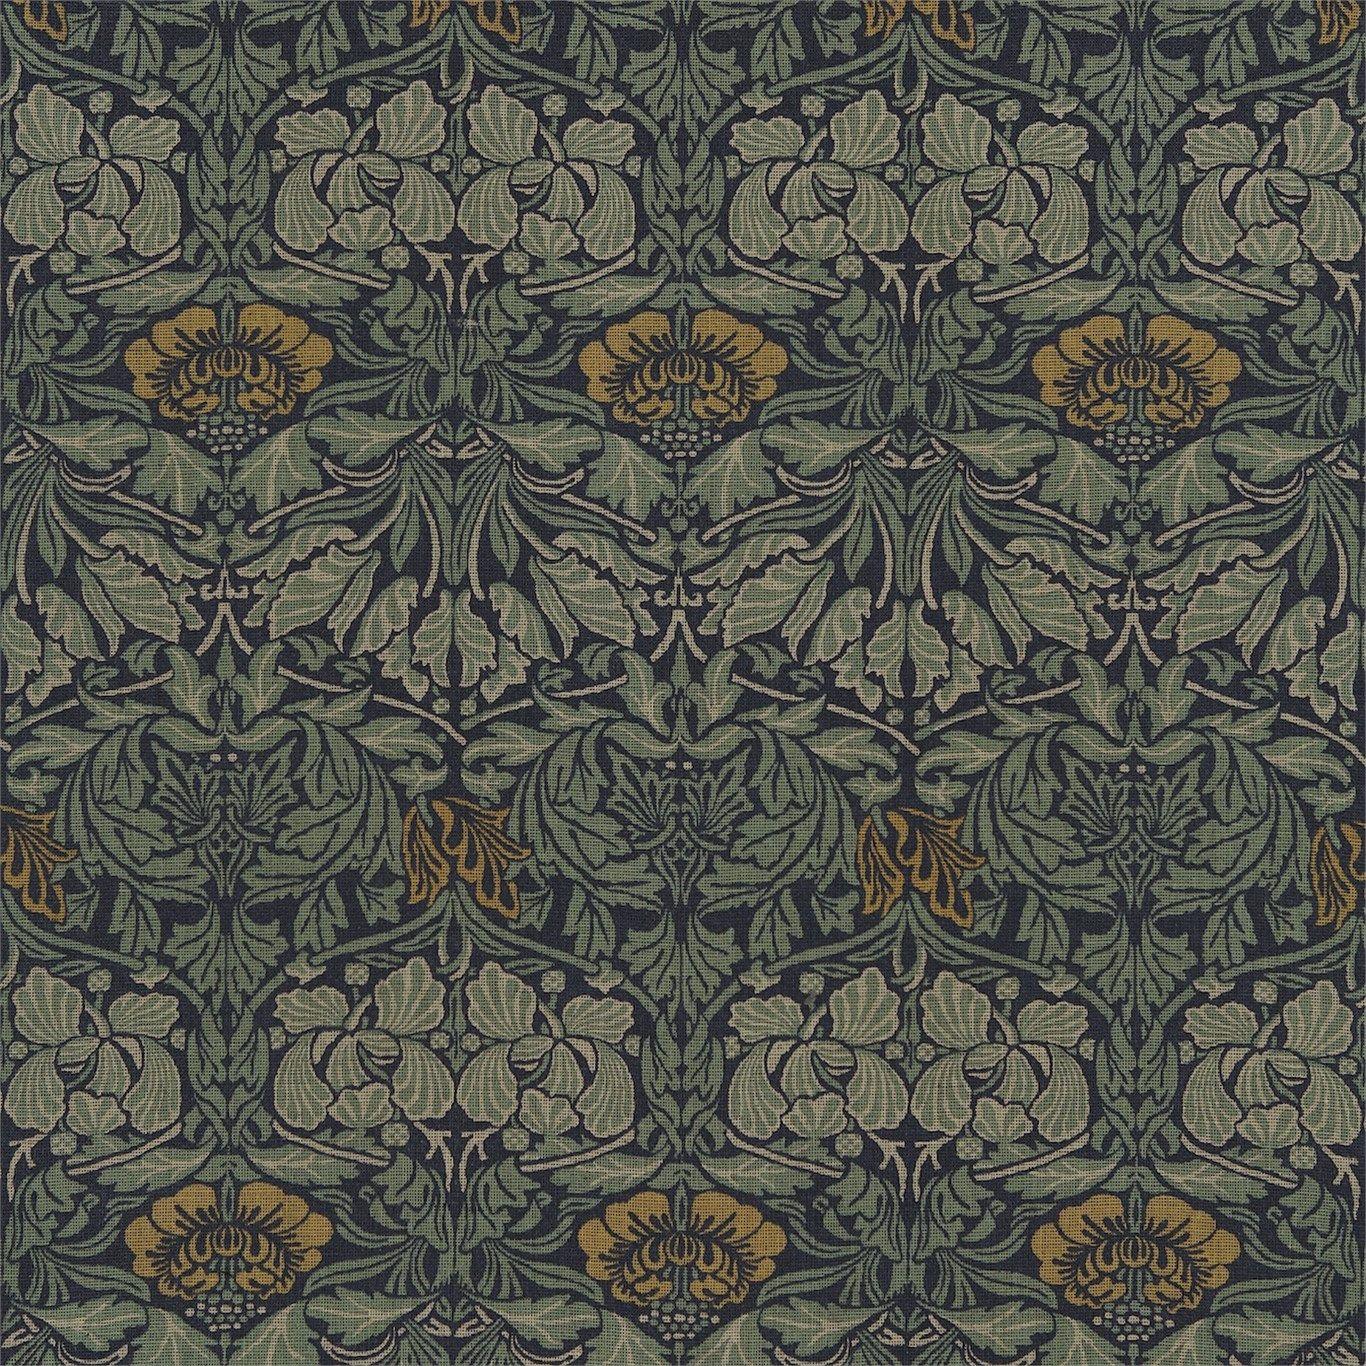 The Original Morris Co Arts And Crafts Fabrics And Wallpaper Designs By William Morris Com William Morris Patterns William Morris William Morris Designs